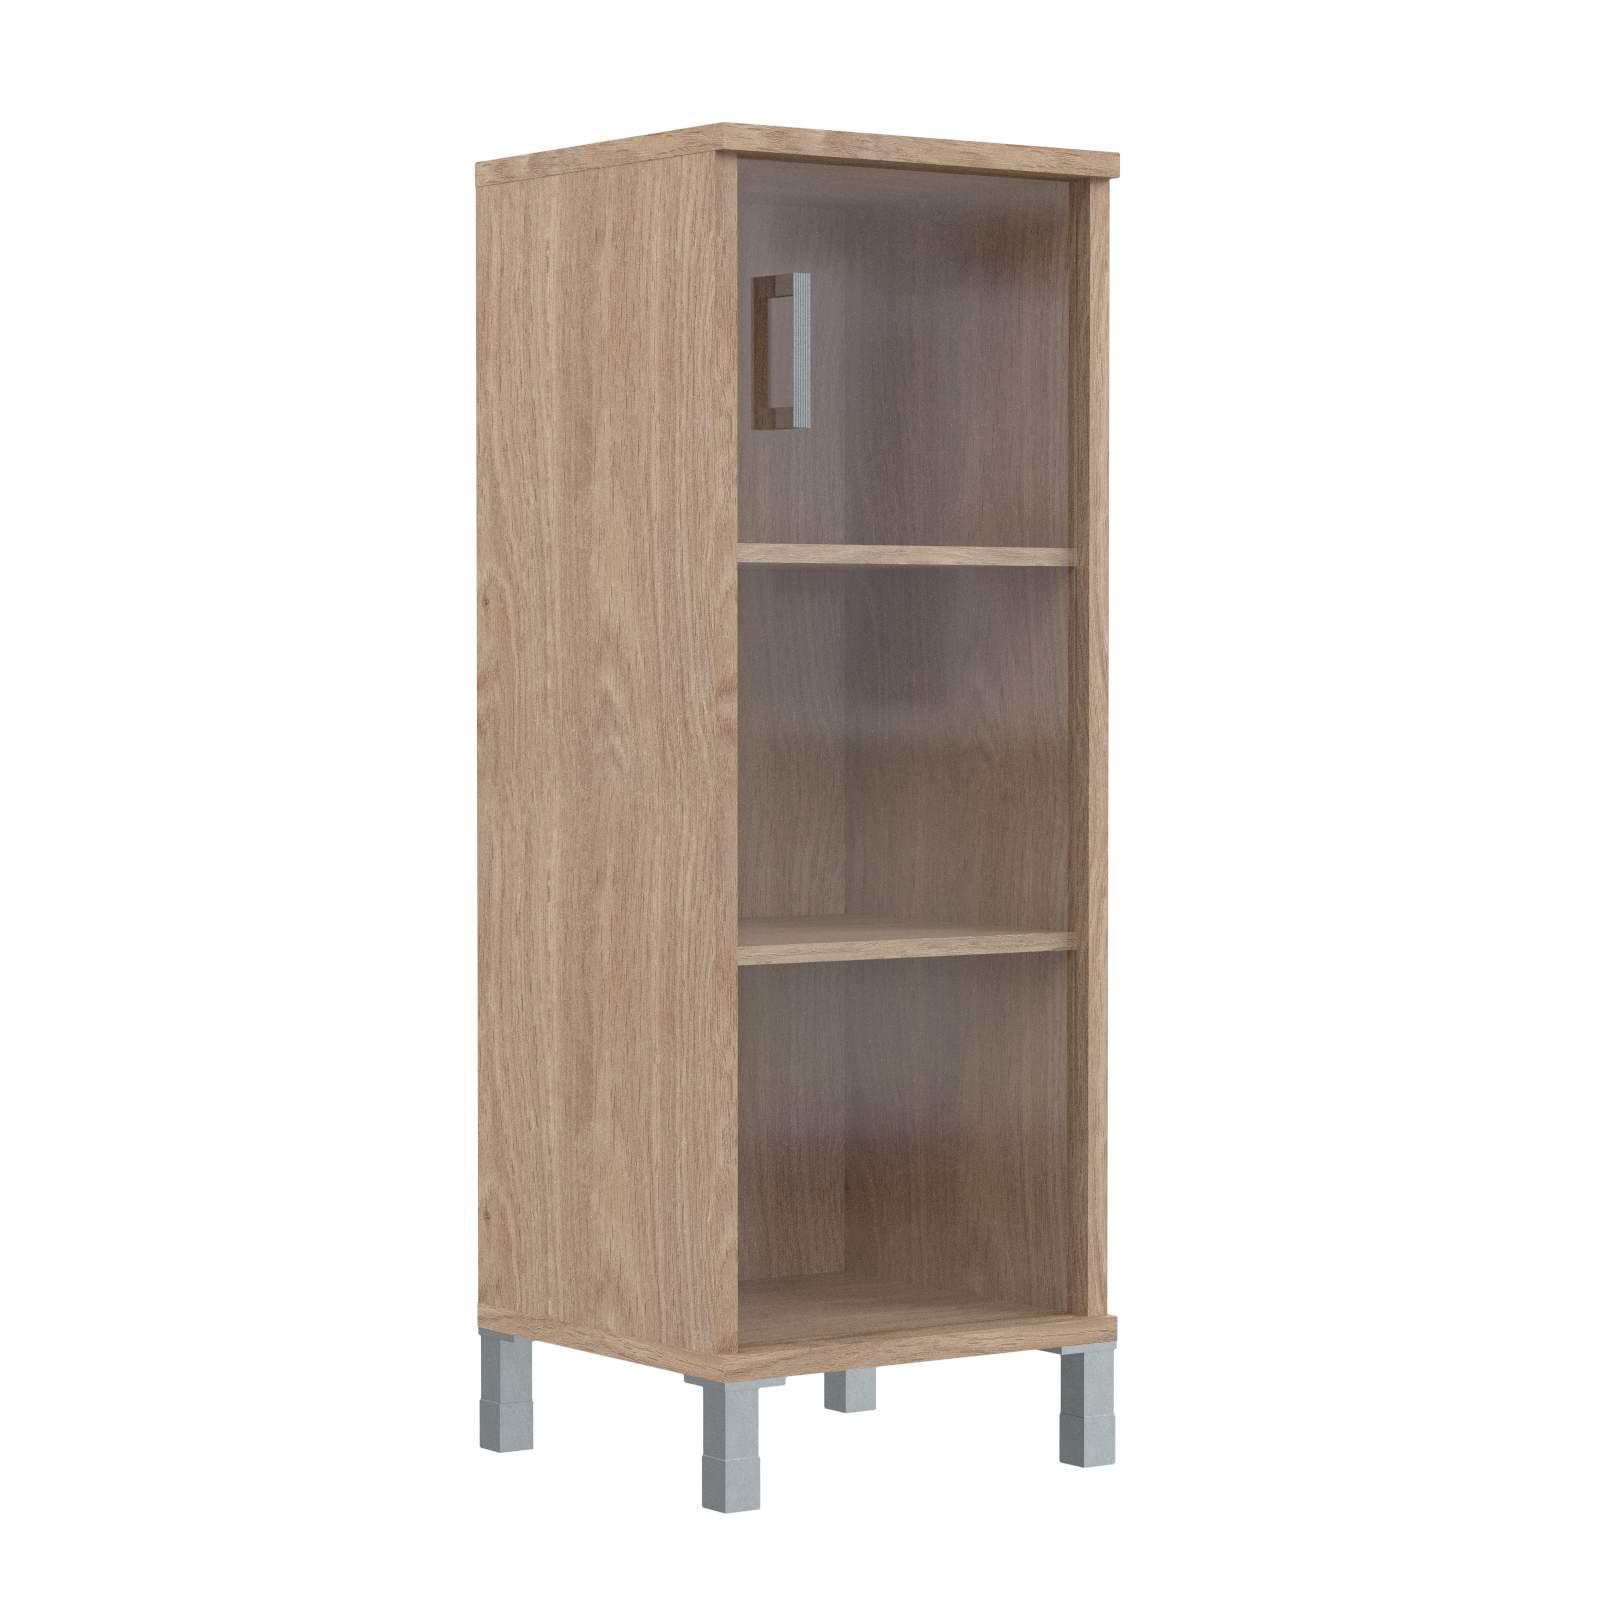 Шкаф колонка средняя со стеклянной дверью 475х435х1236